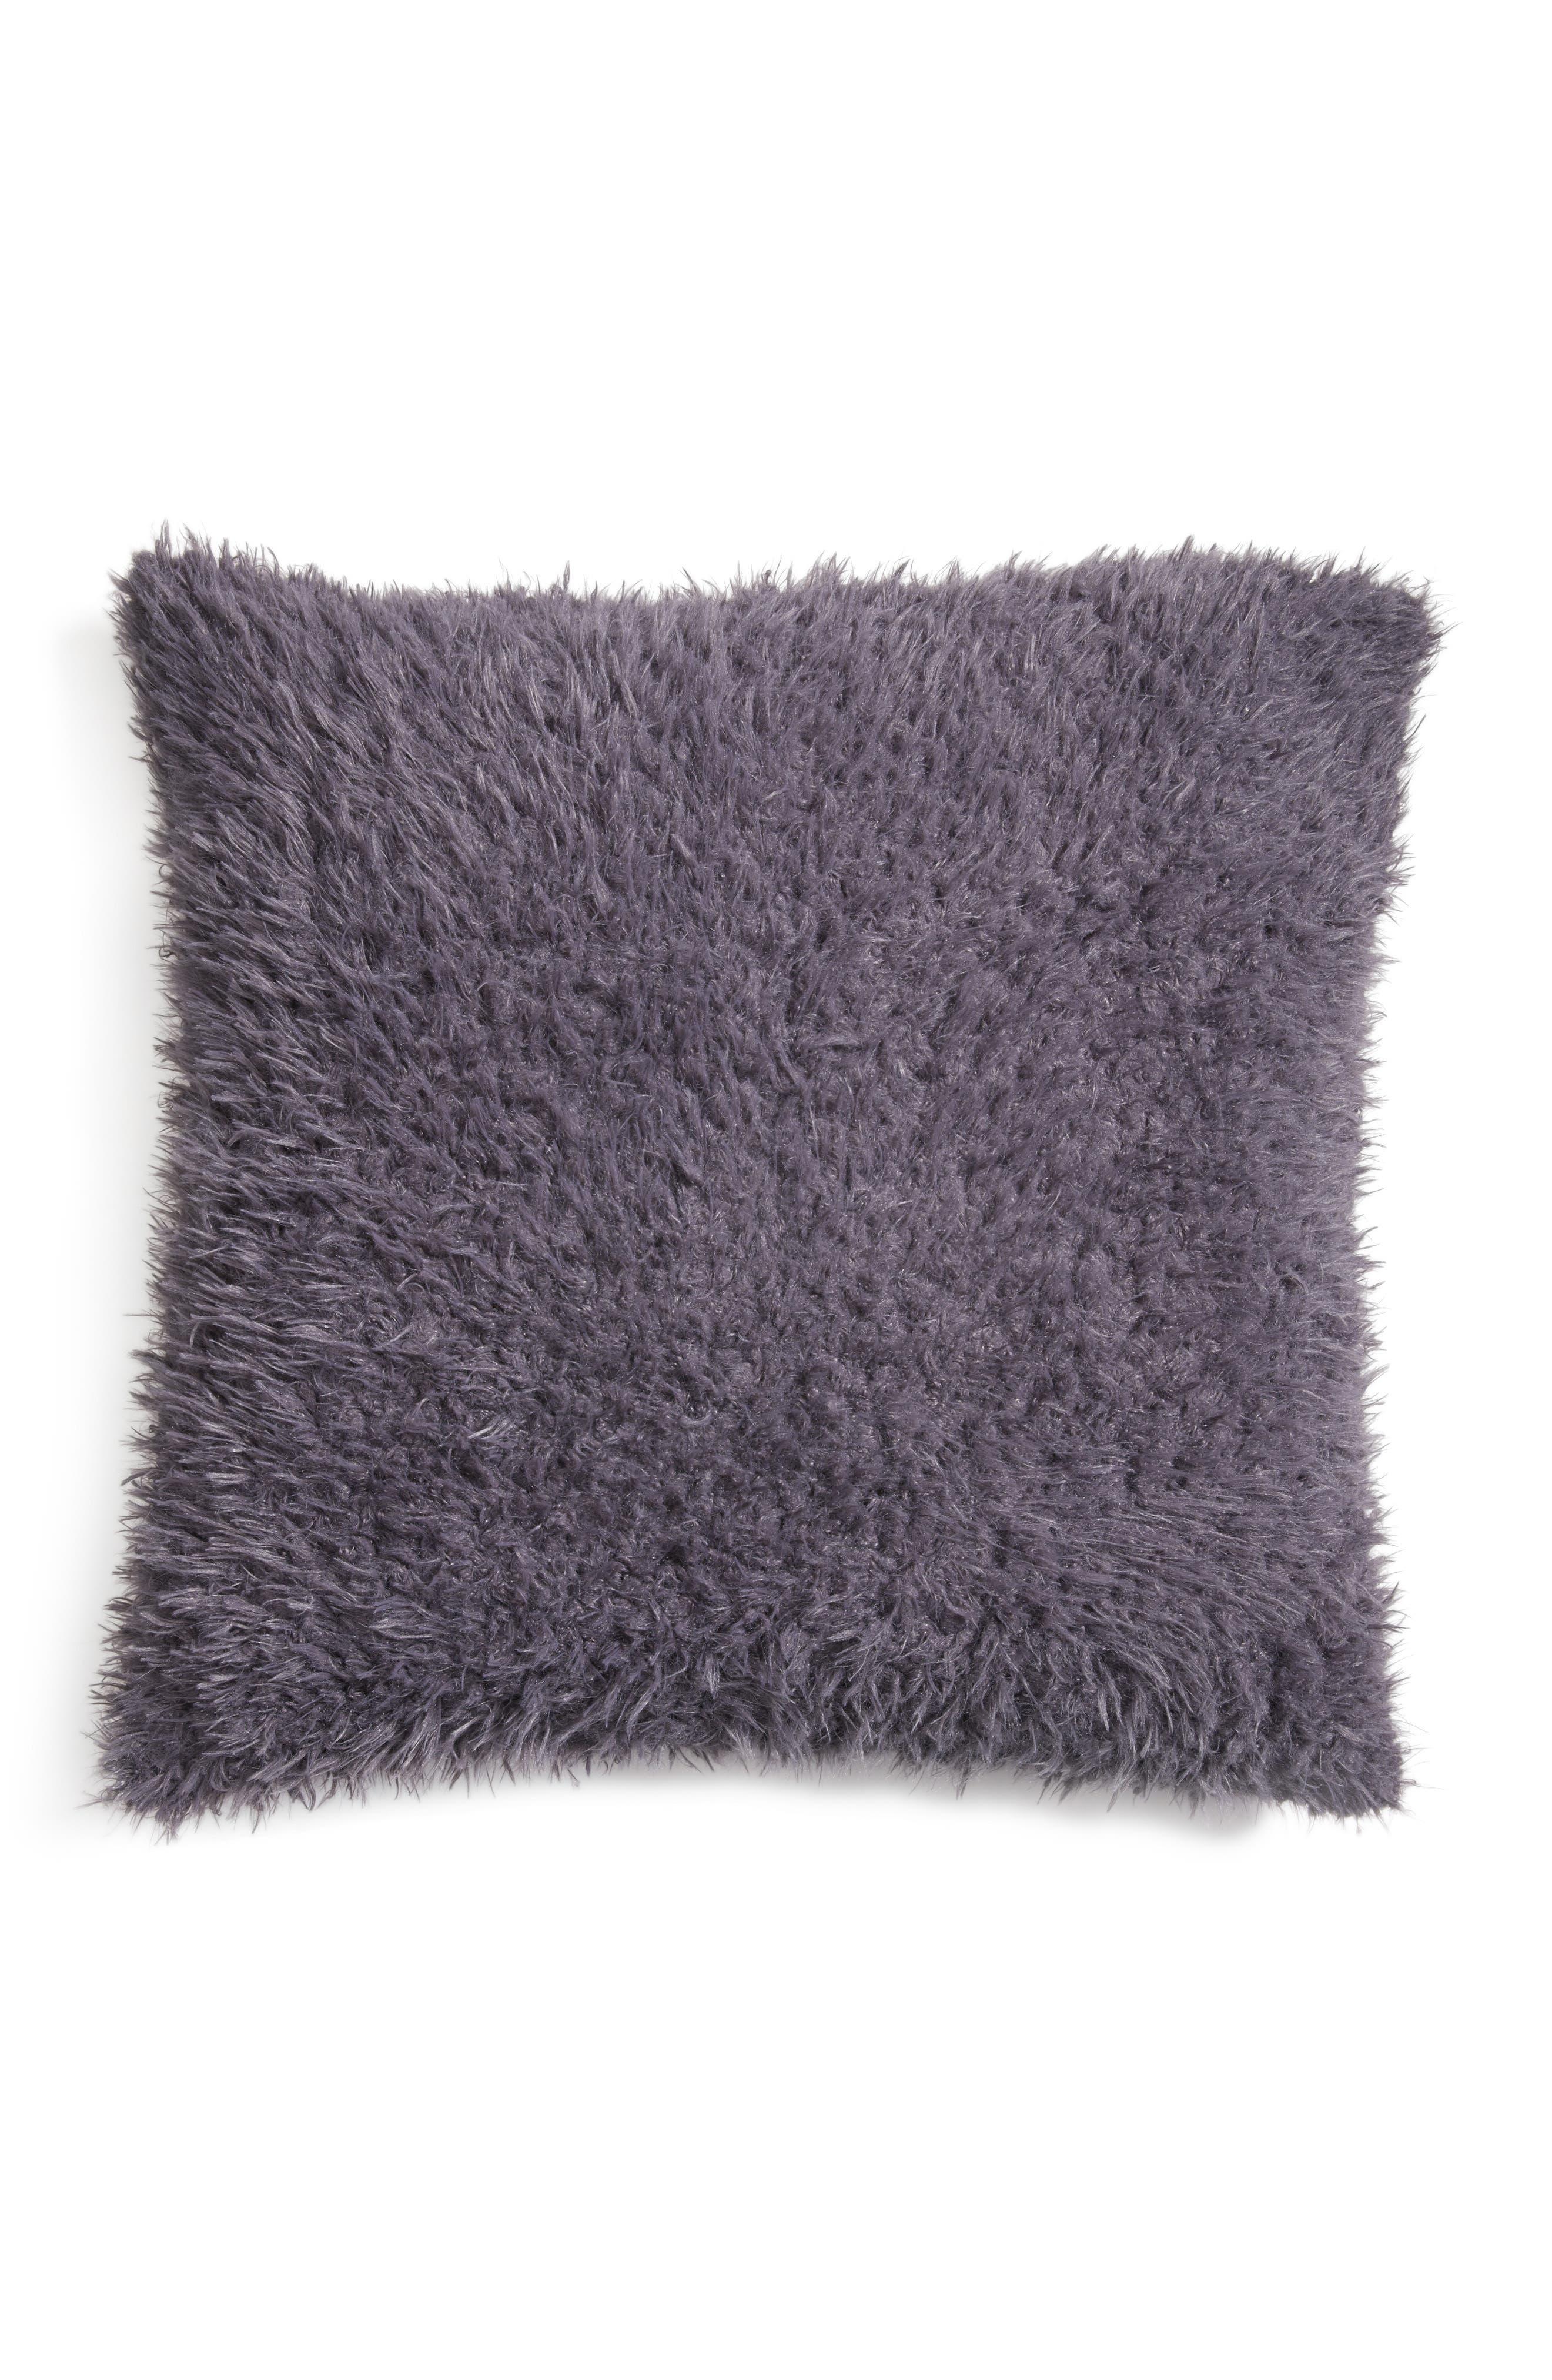 Shaggy Plush Pillow,                         Main,                         color, Grey Excalibur